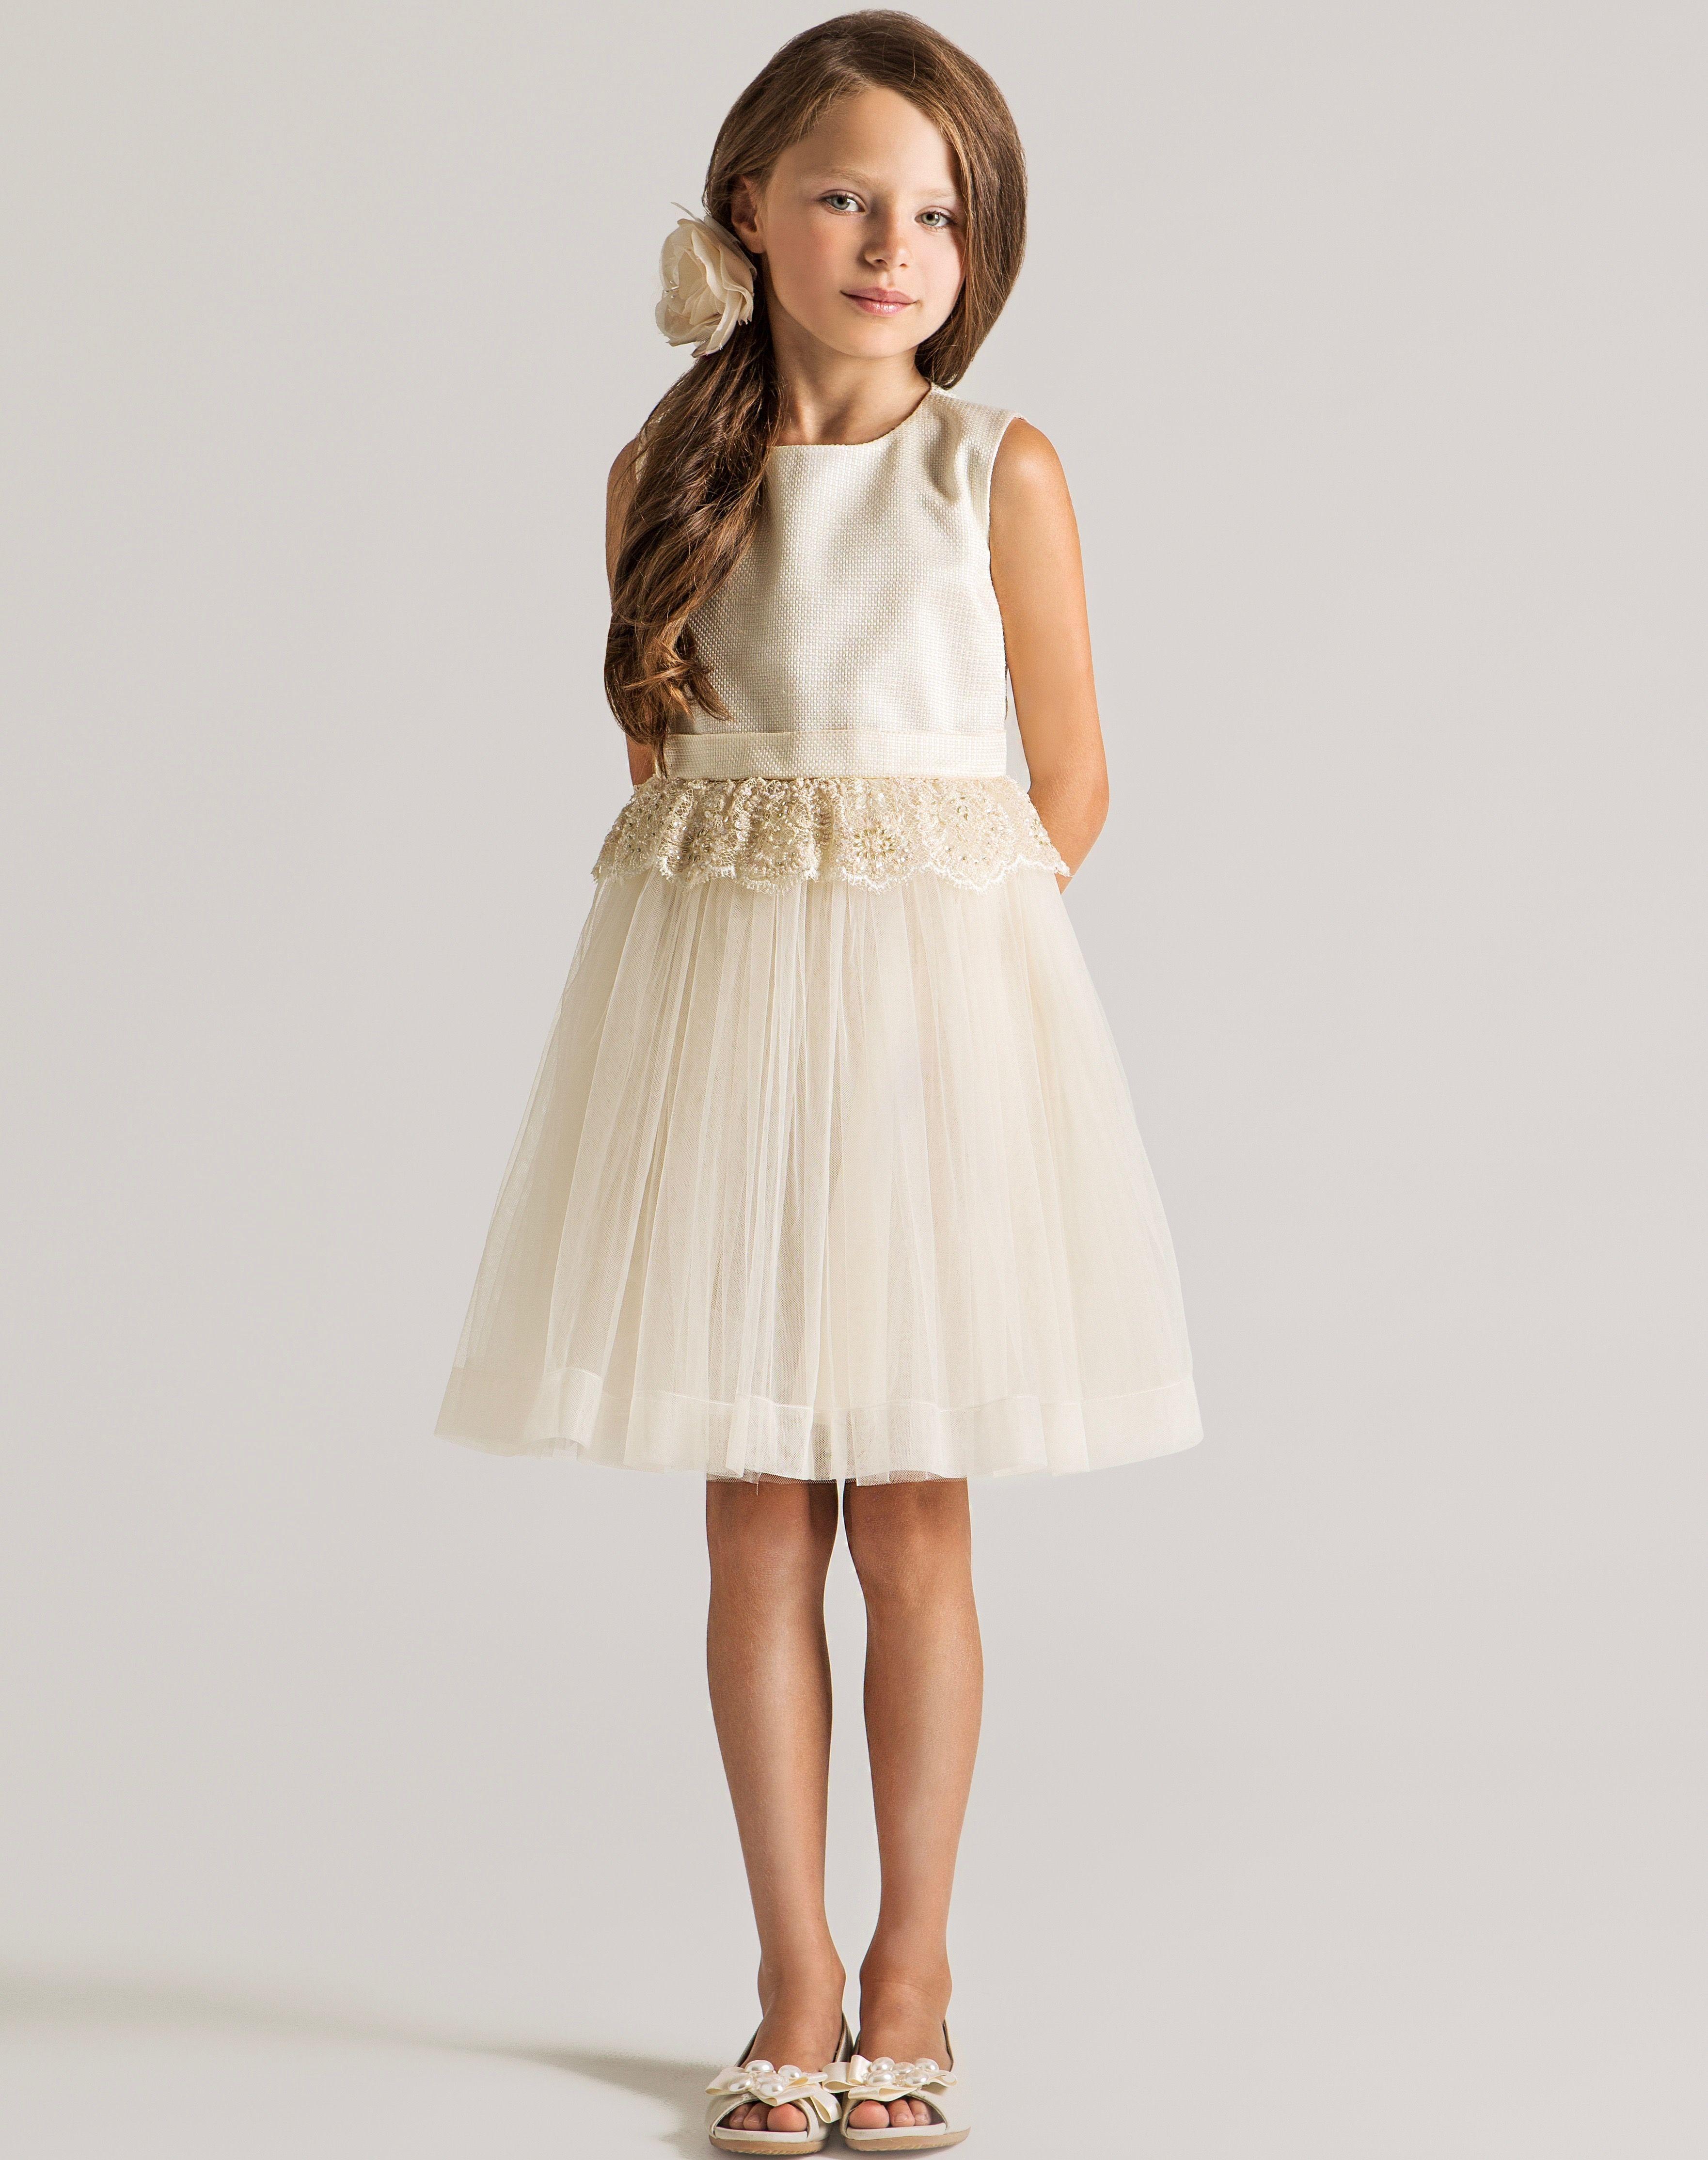 0fe4a743e35a Top 7 Kids Fashion Trends - Papilio Kids